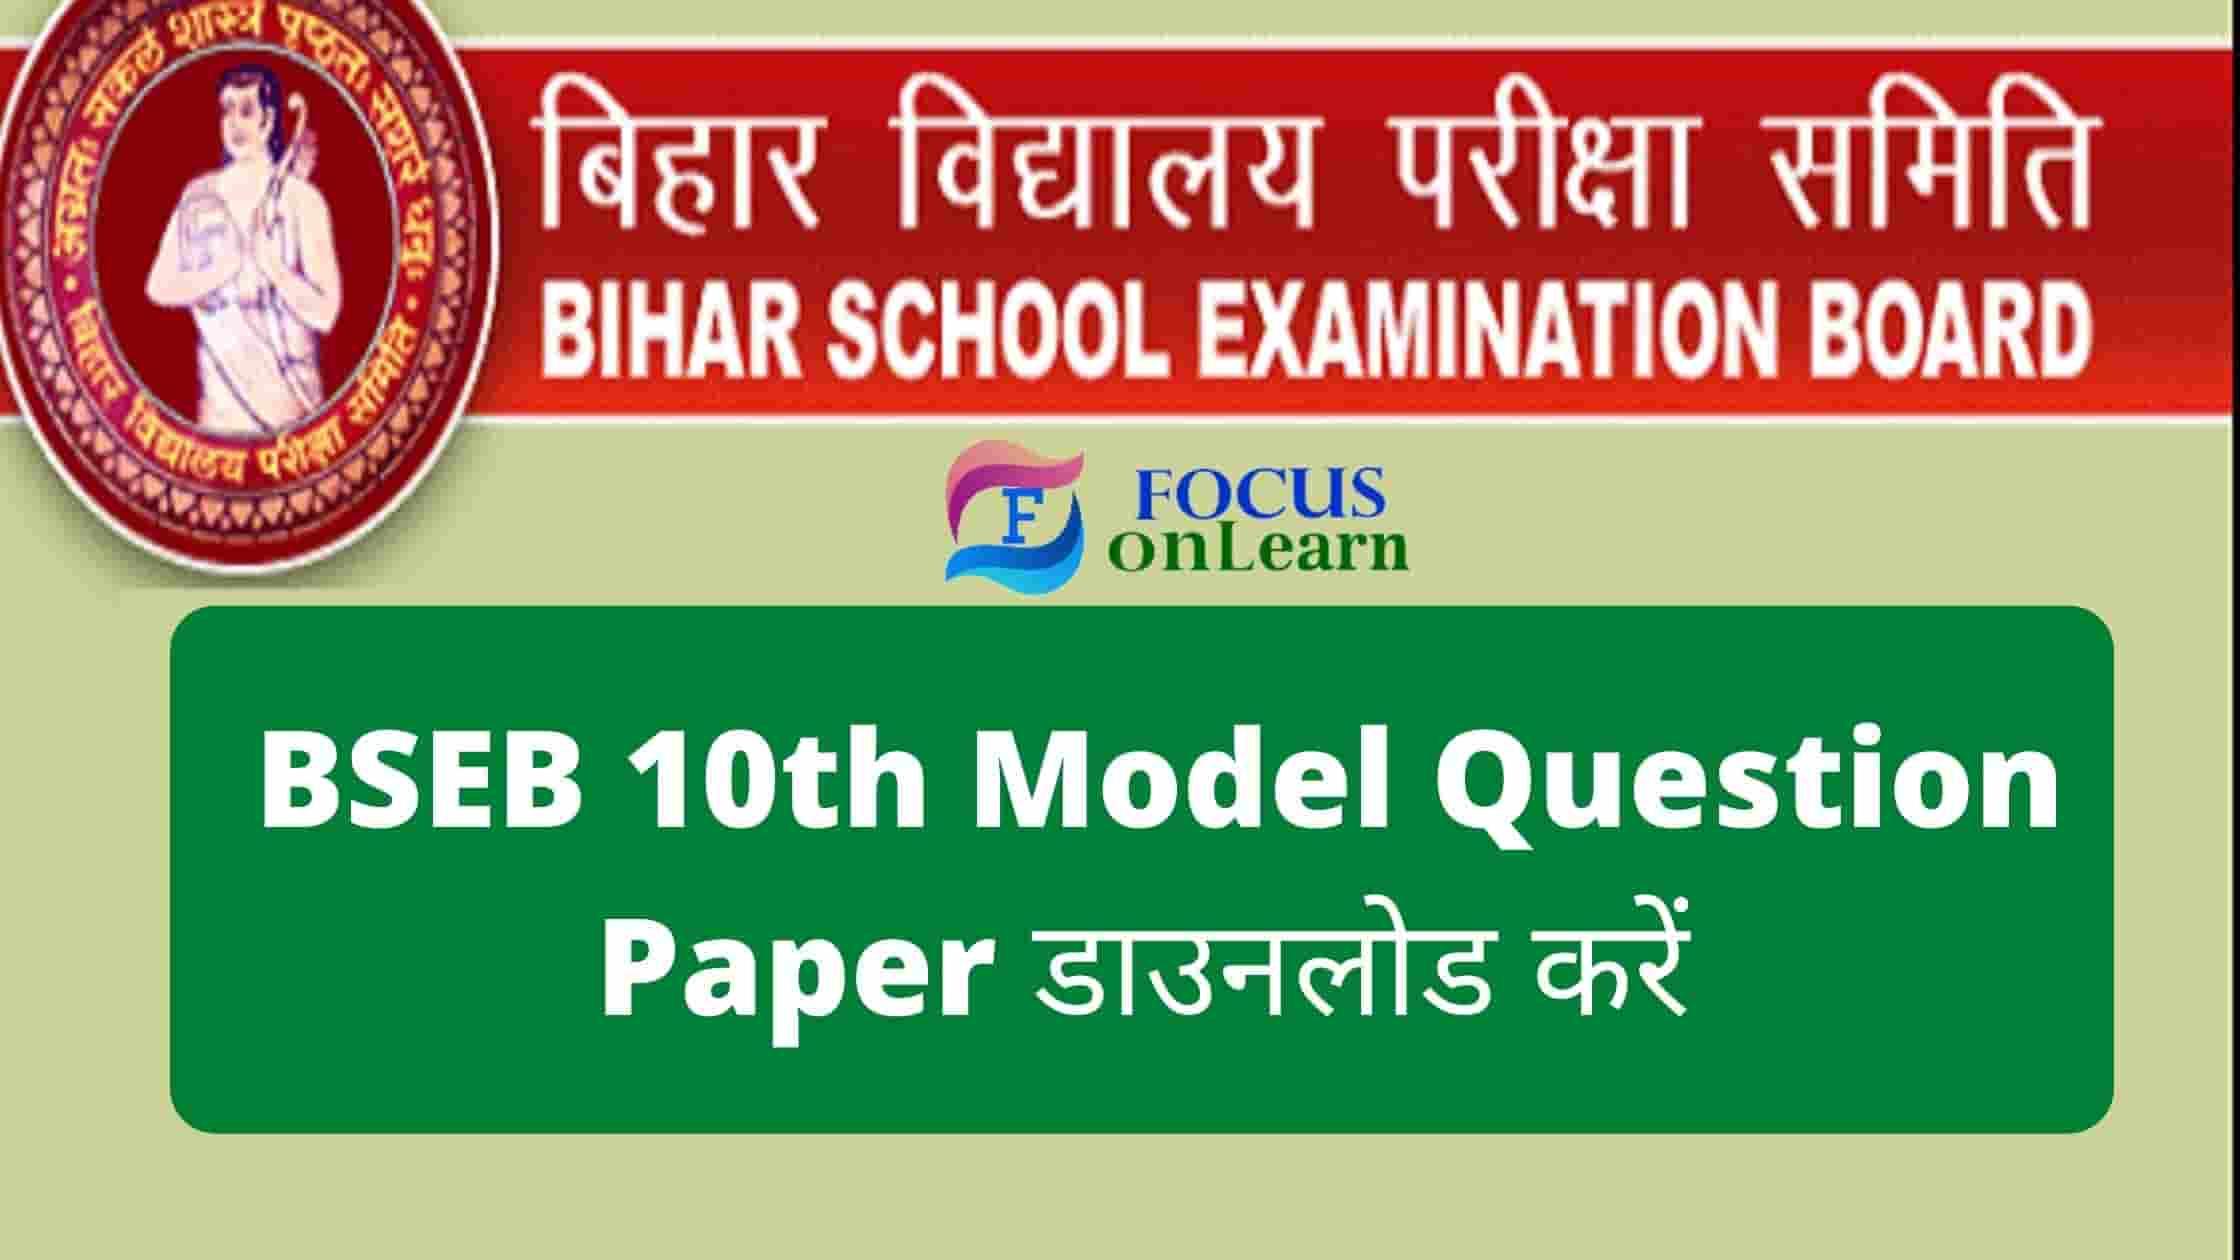 BSEB 10th Model Paper